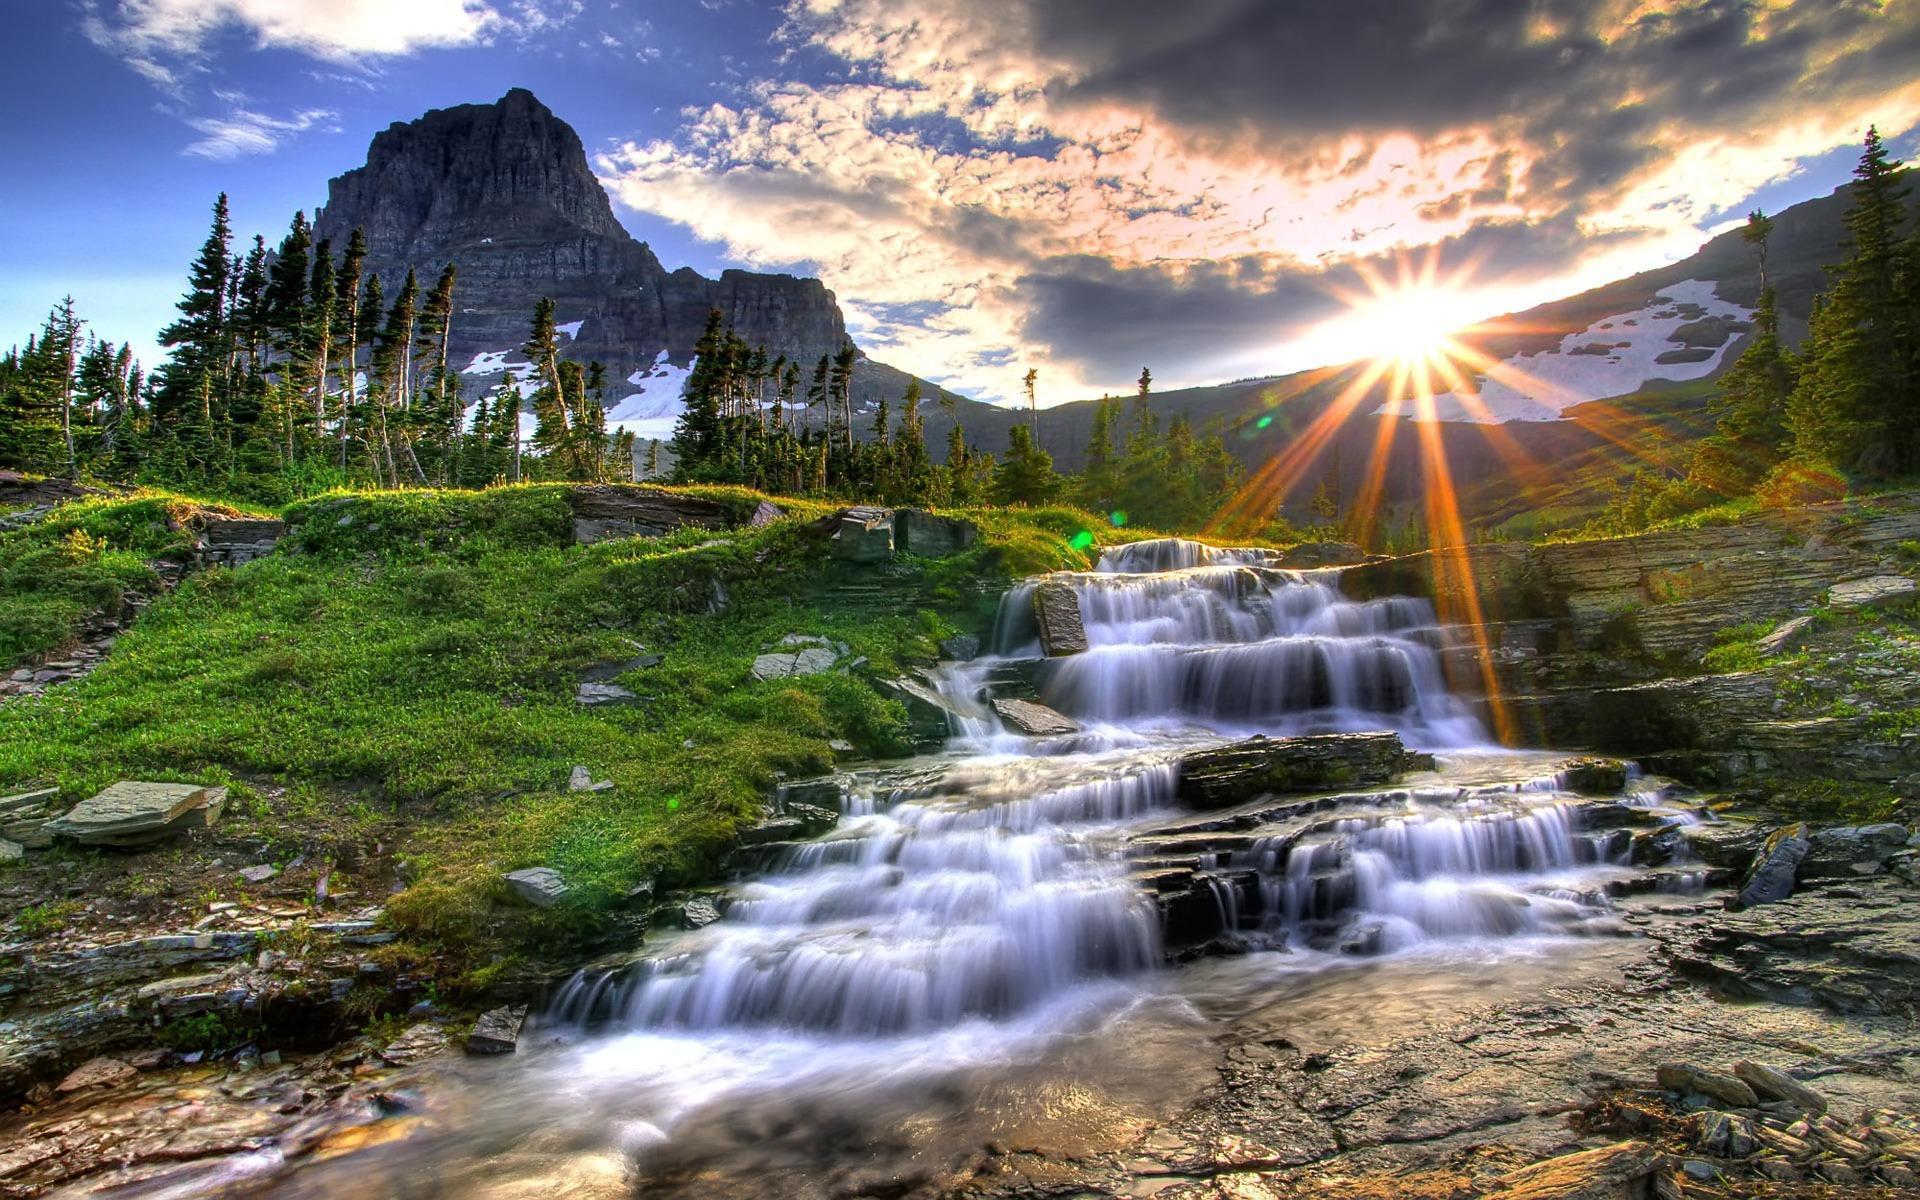 Montana sunset mountain river wallpapers photos pictures 1920x1200